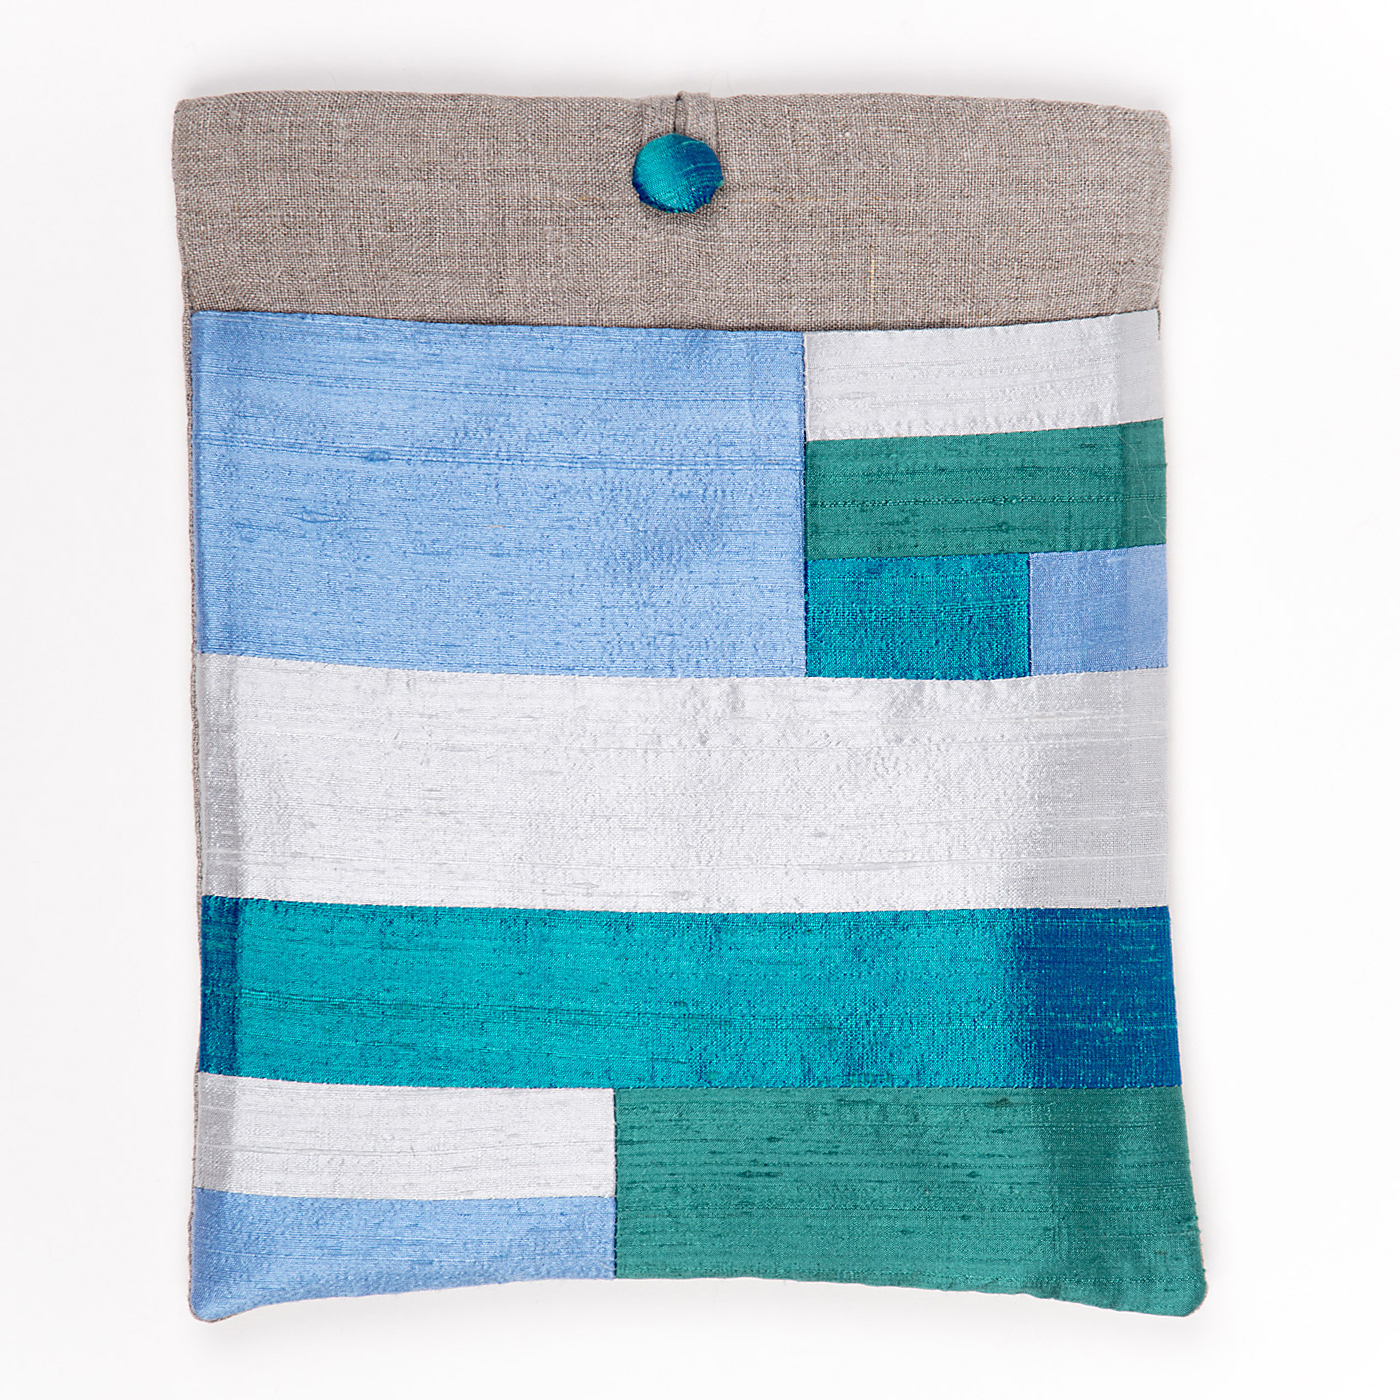 Artisan, Eco-Friendly, Designer Silken Stripes iPad Case